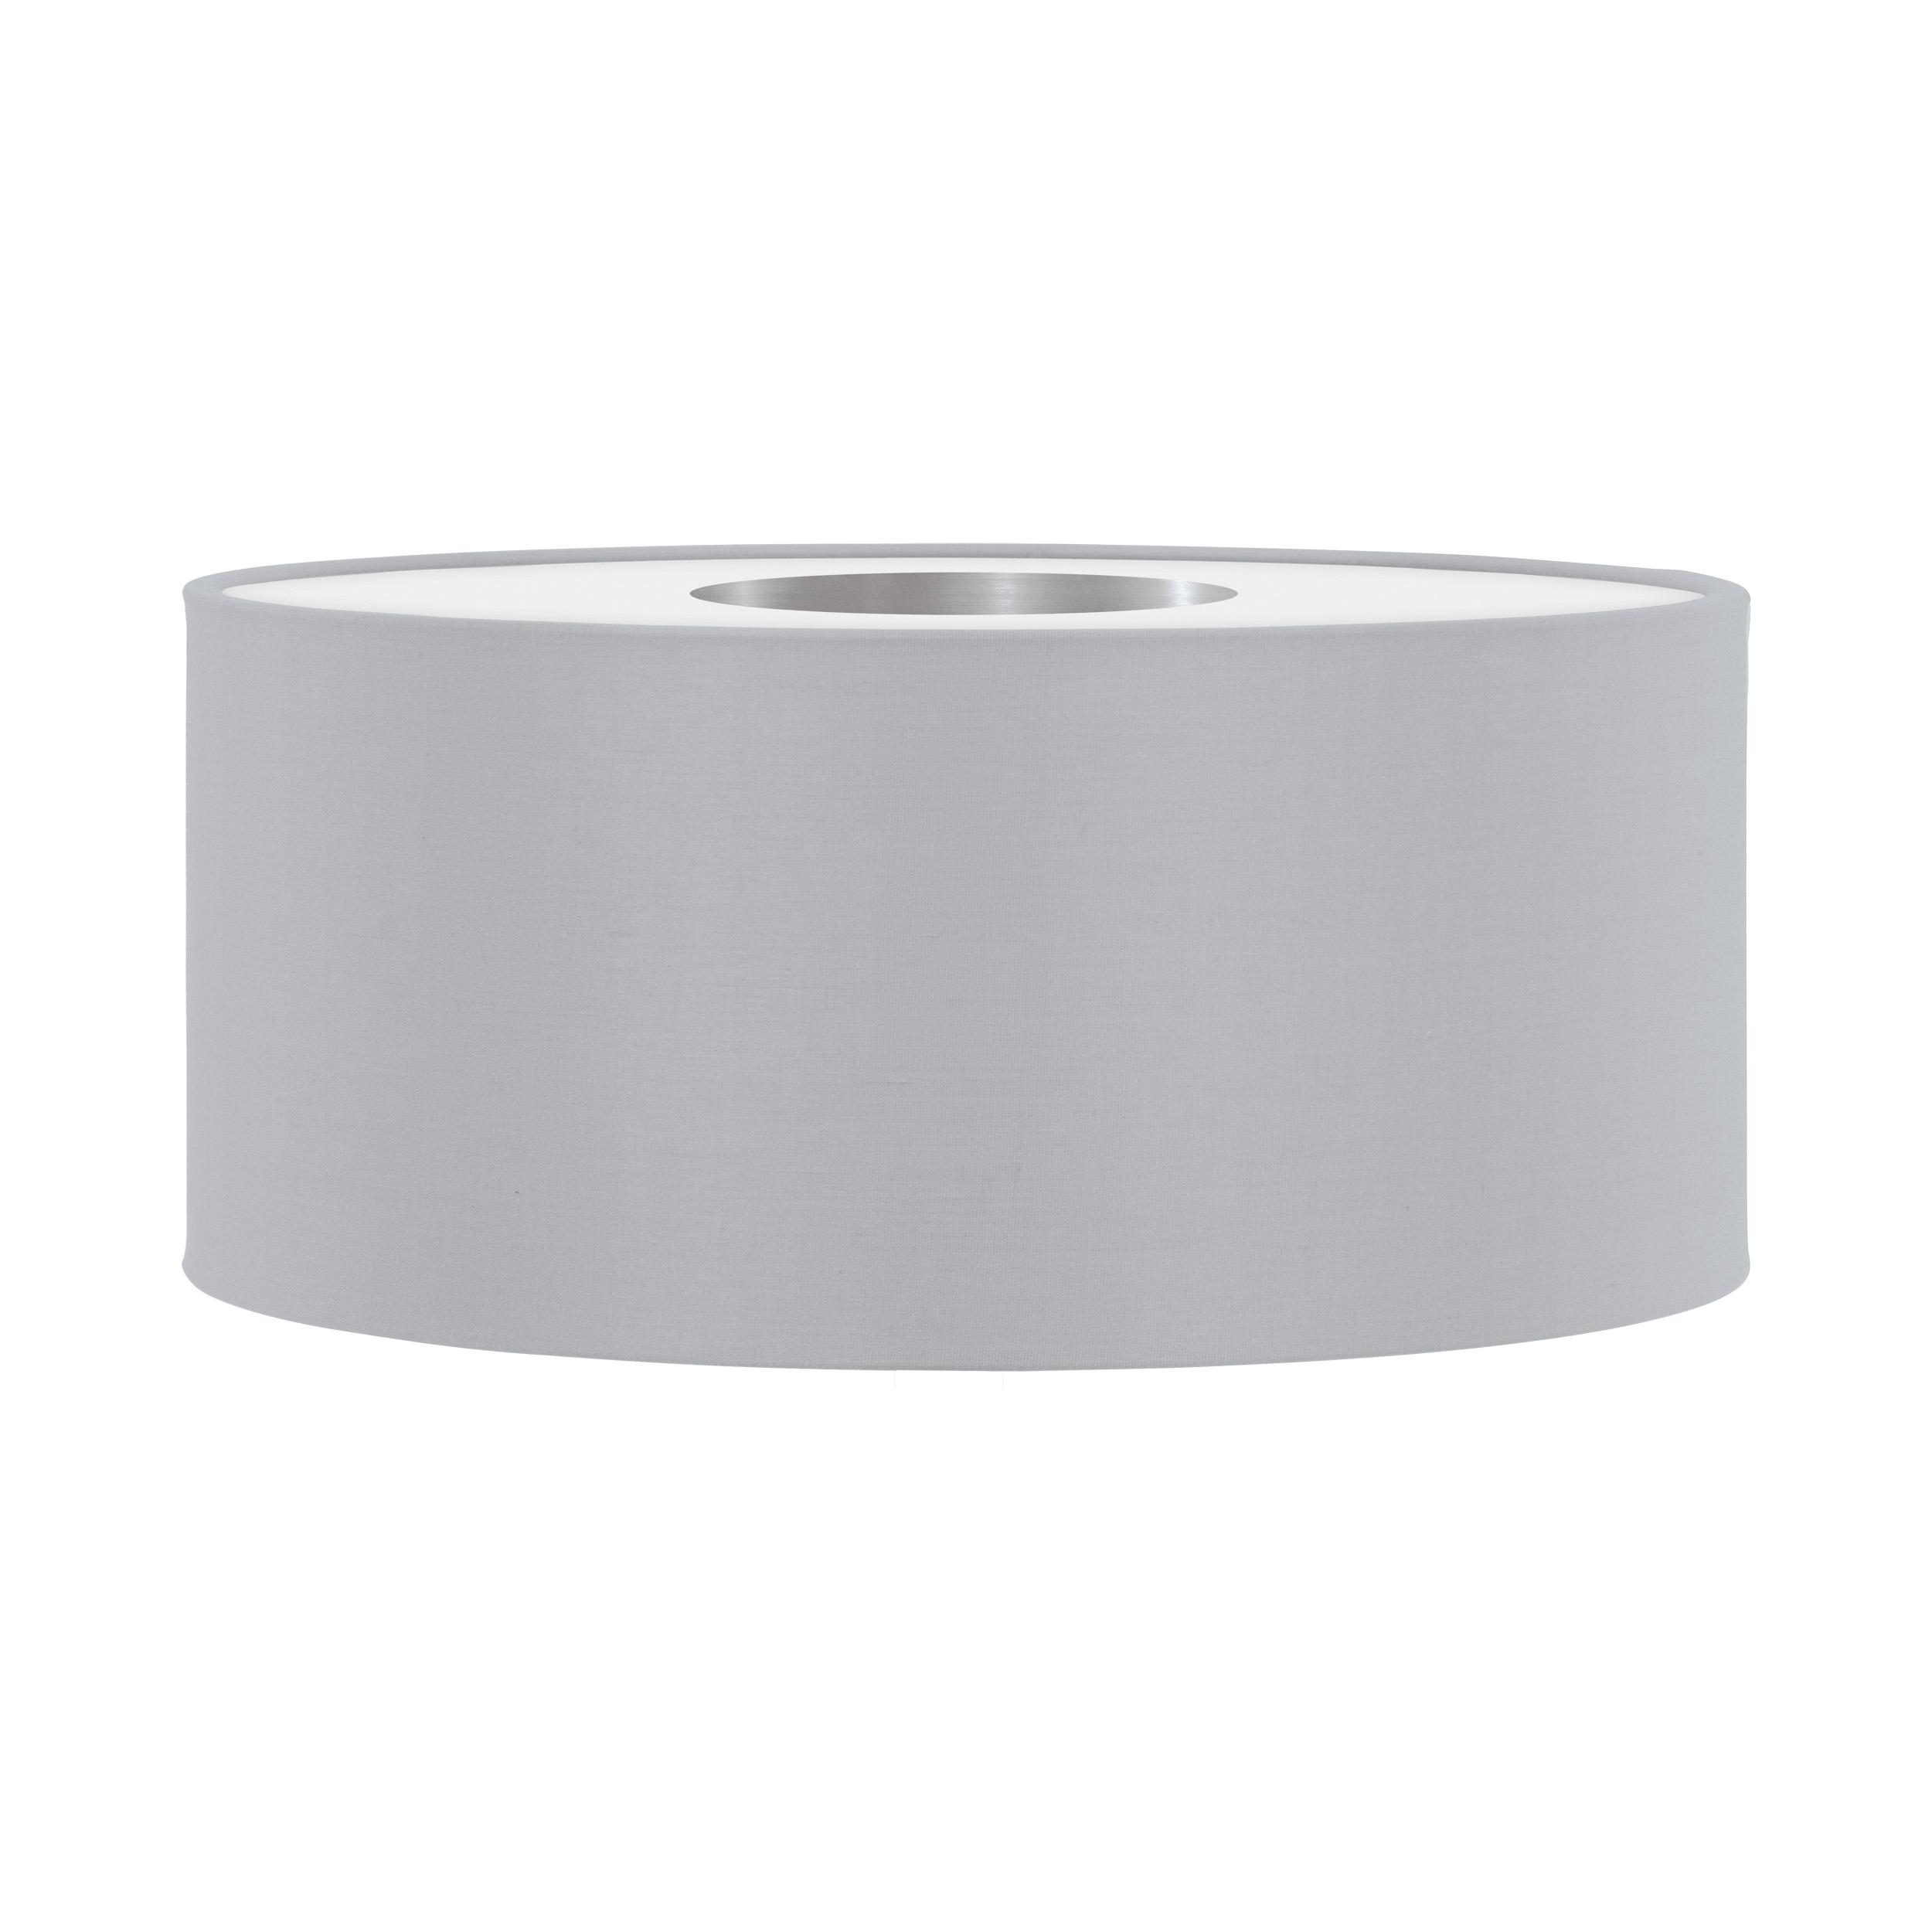 1 Stk Schirm Pasteri Pro inkl. Diffuser grau/silber  LI62697---